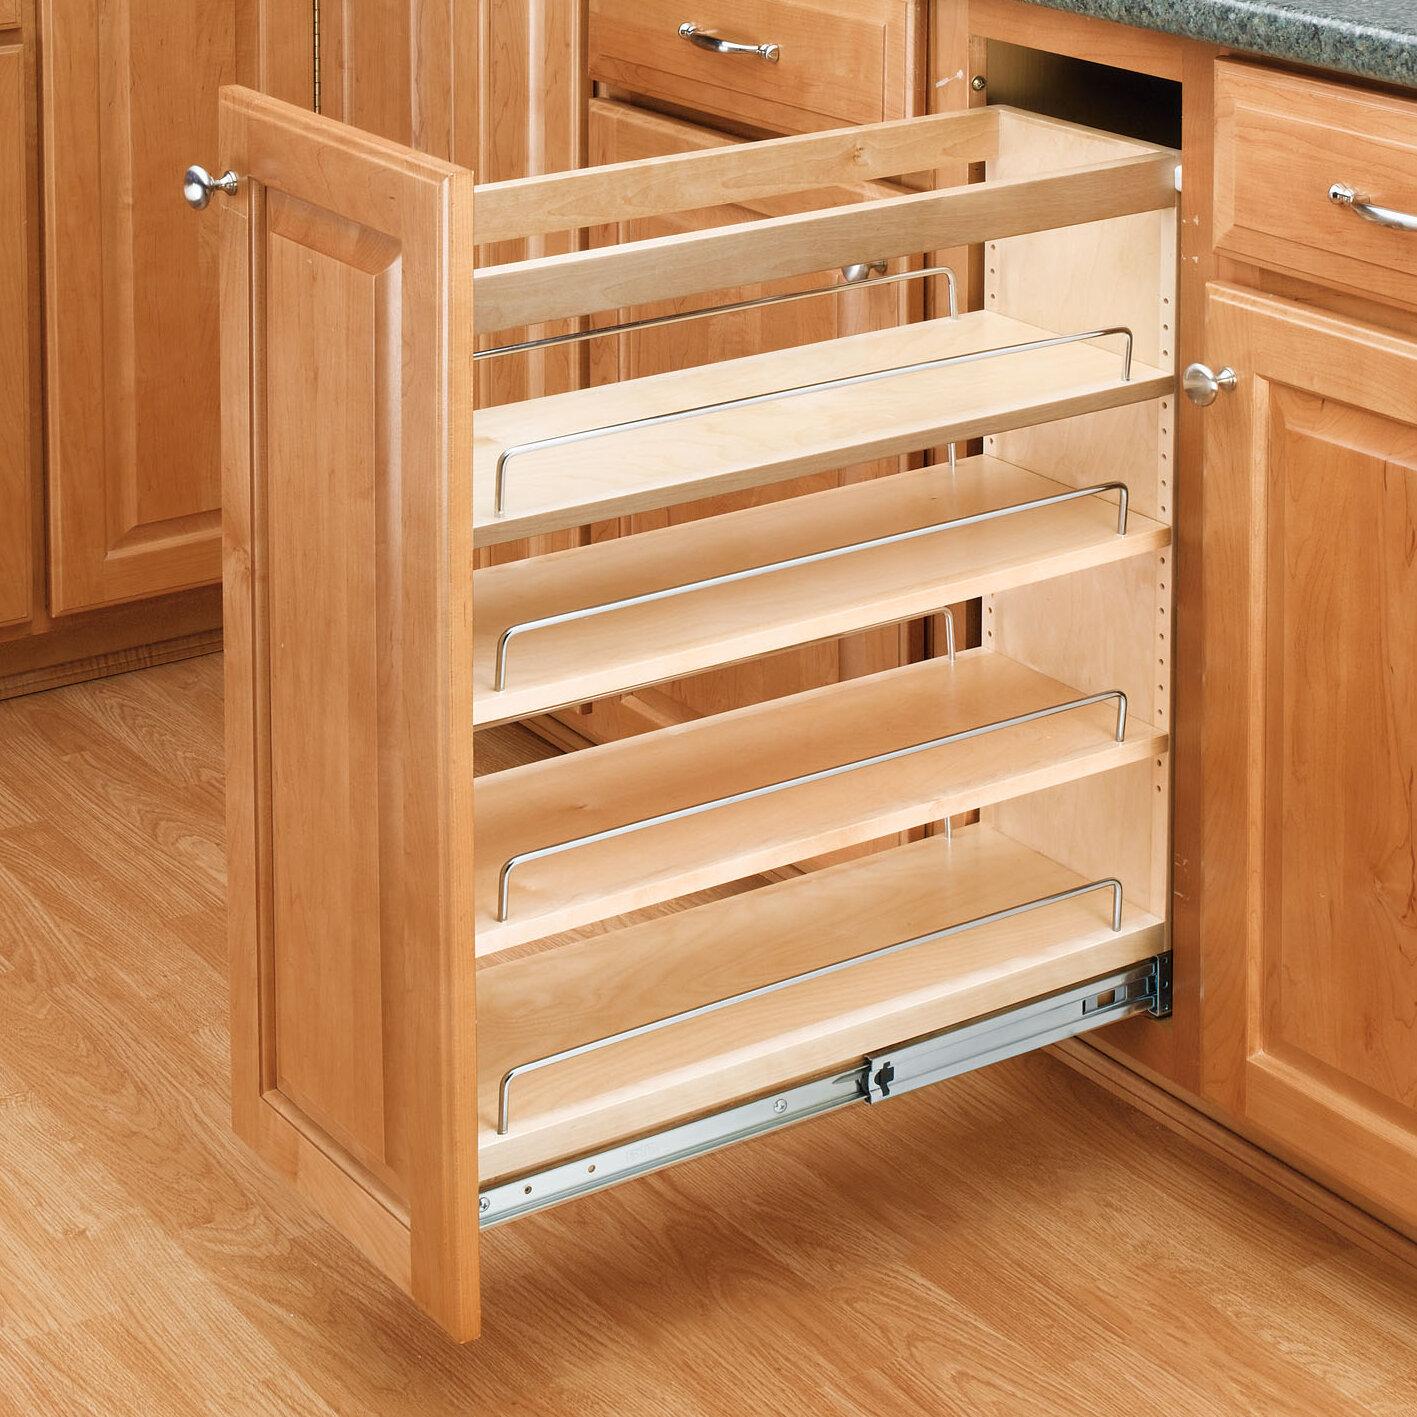 tier organizer a shelf base design elegant cabinet cookware of two lowes rev